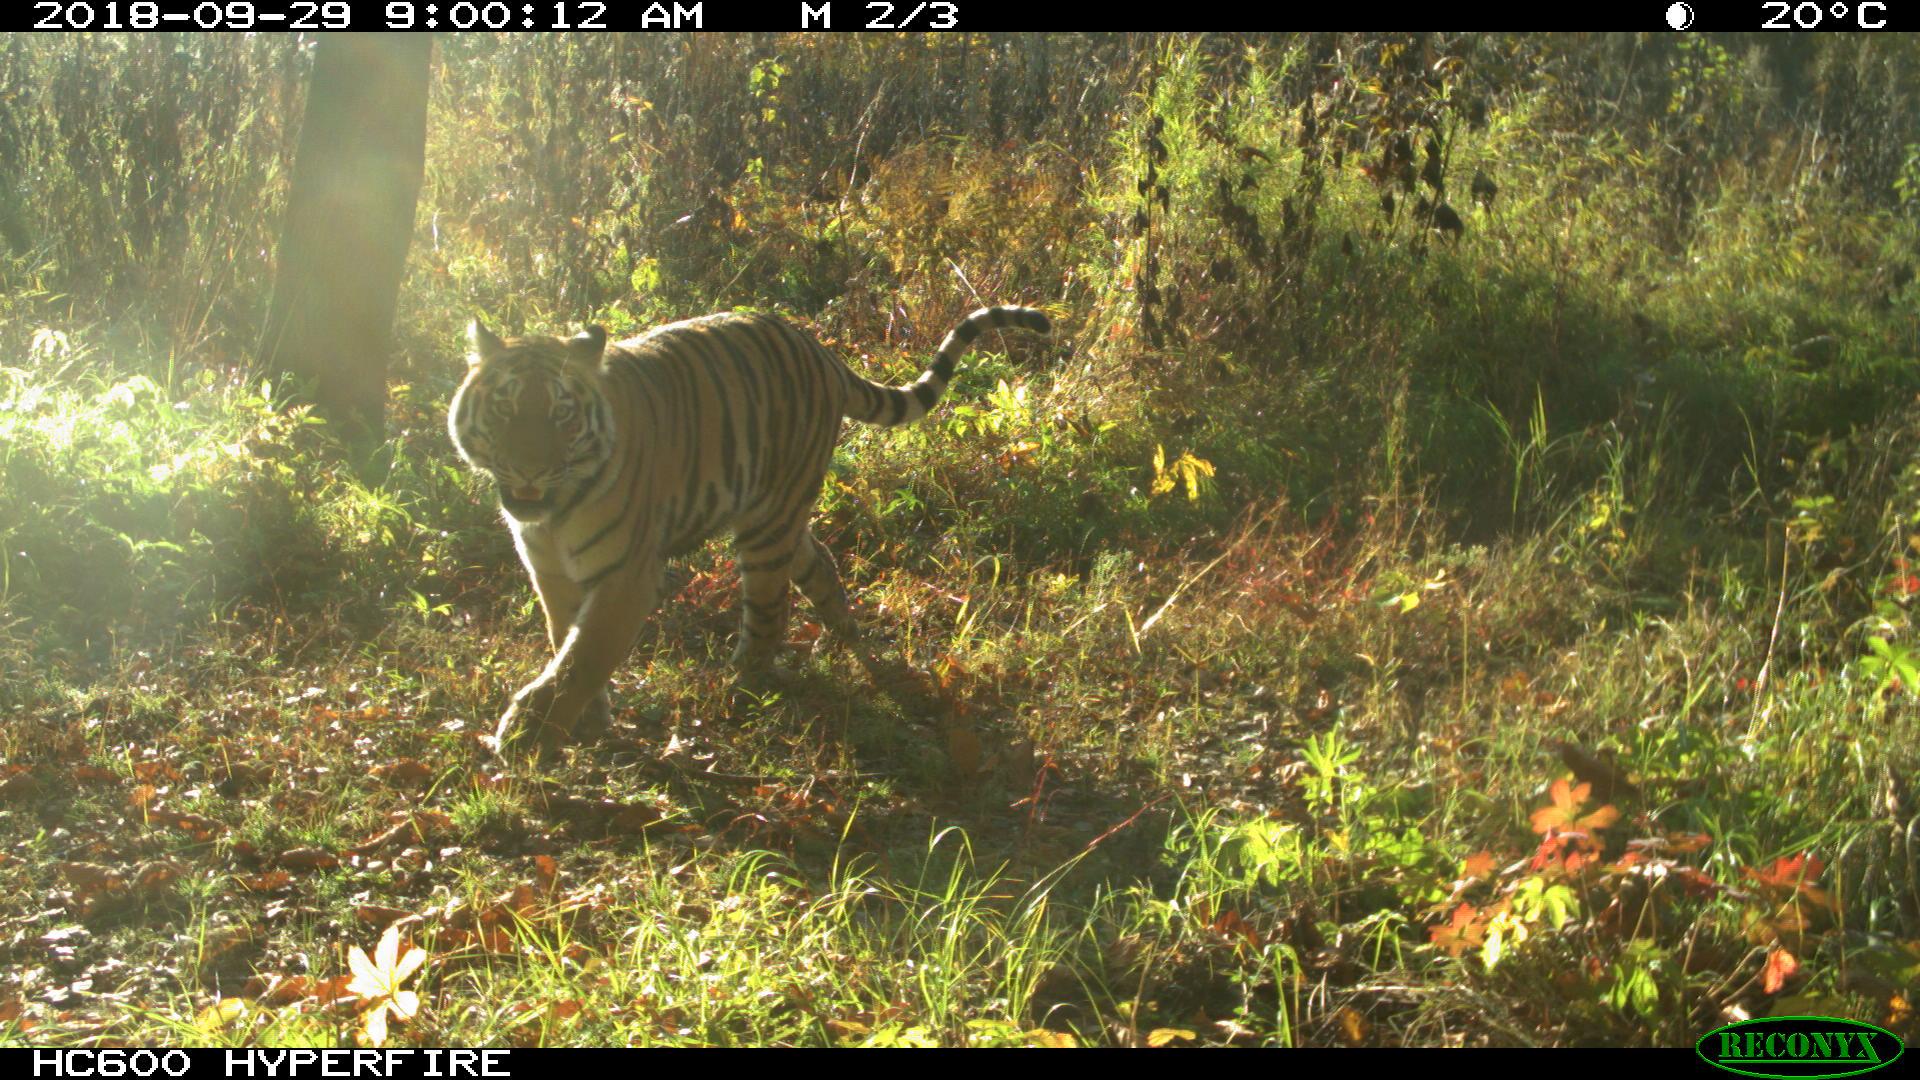 амурский тигр +в природе